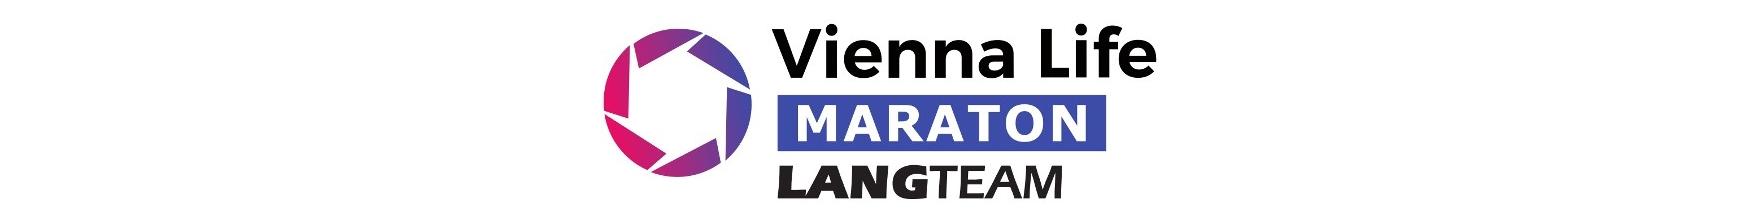 Vienna Life Lang Team Maratony - Baner